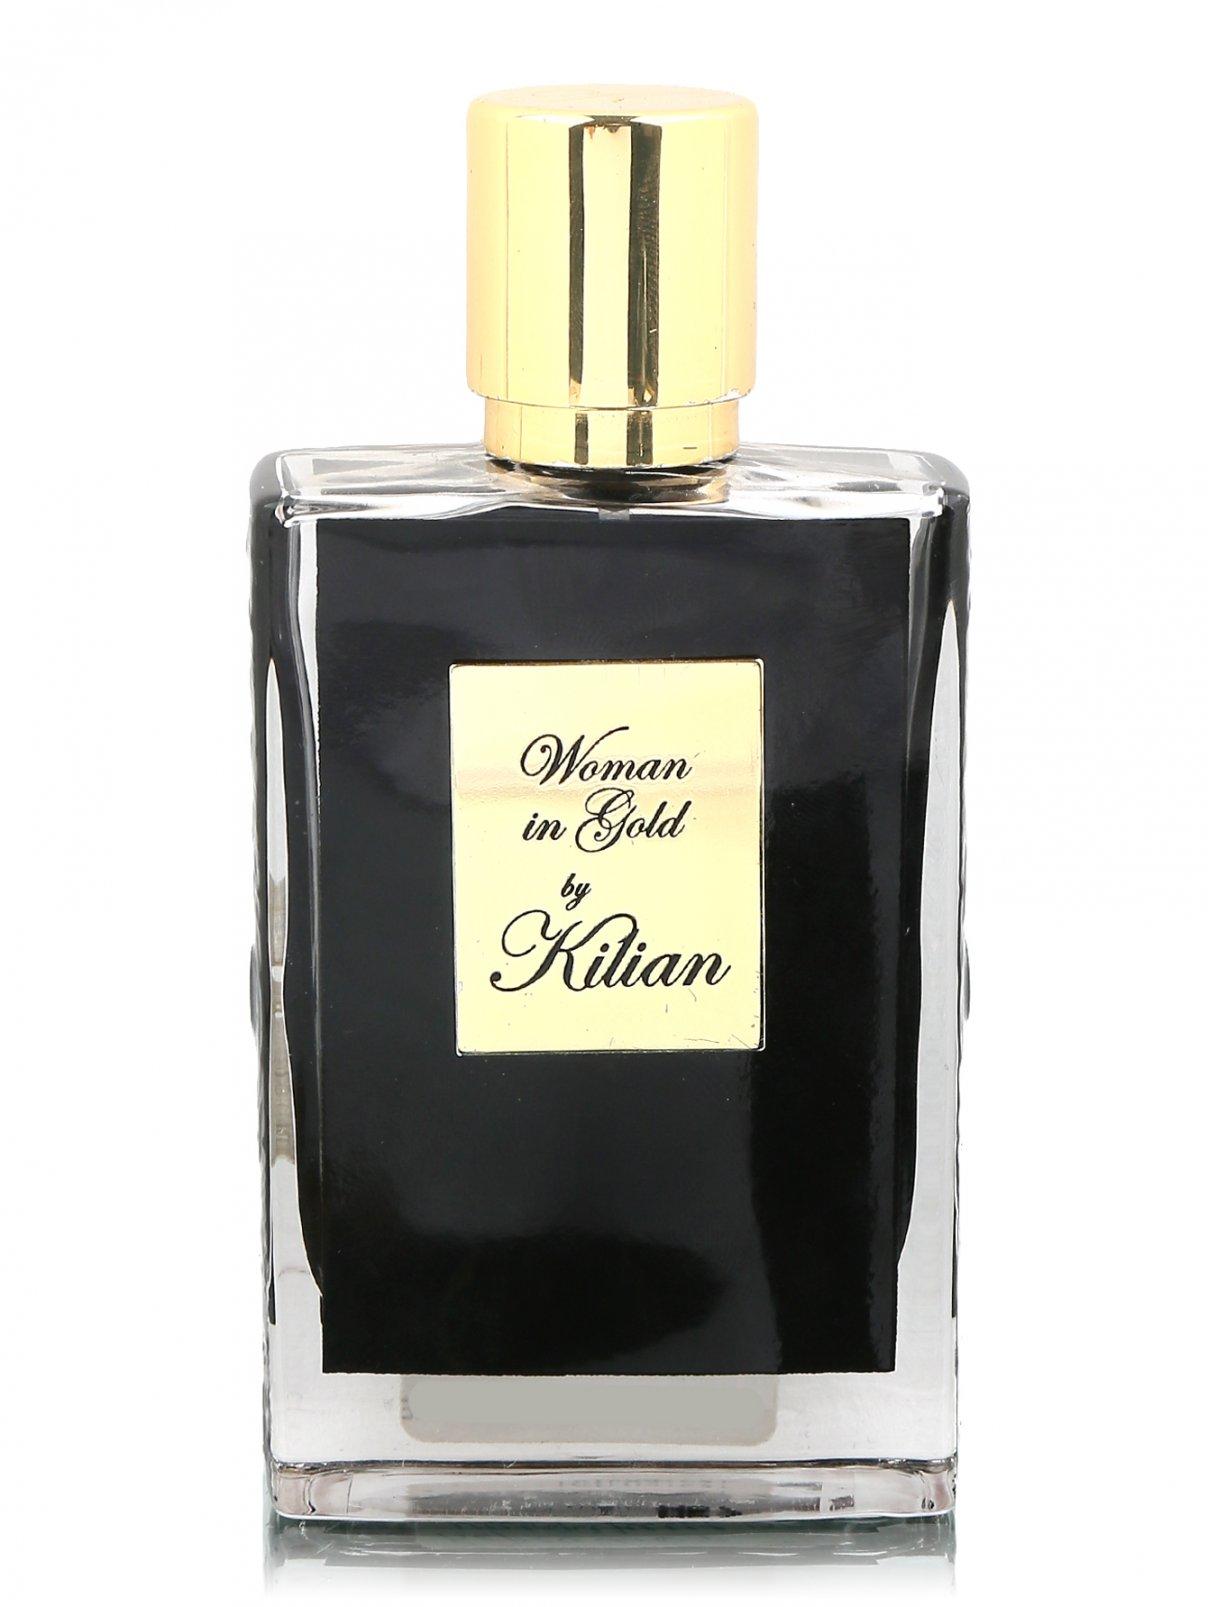 Парфюмерная вода 50 мл Woman in Gold KILIAN  –  Общий вид